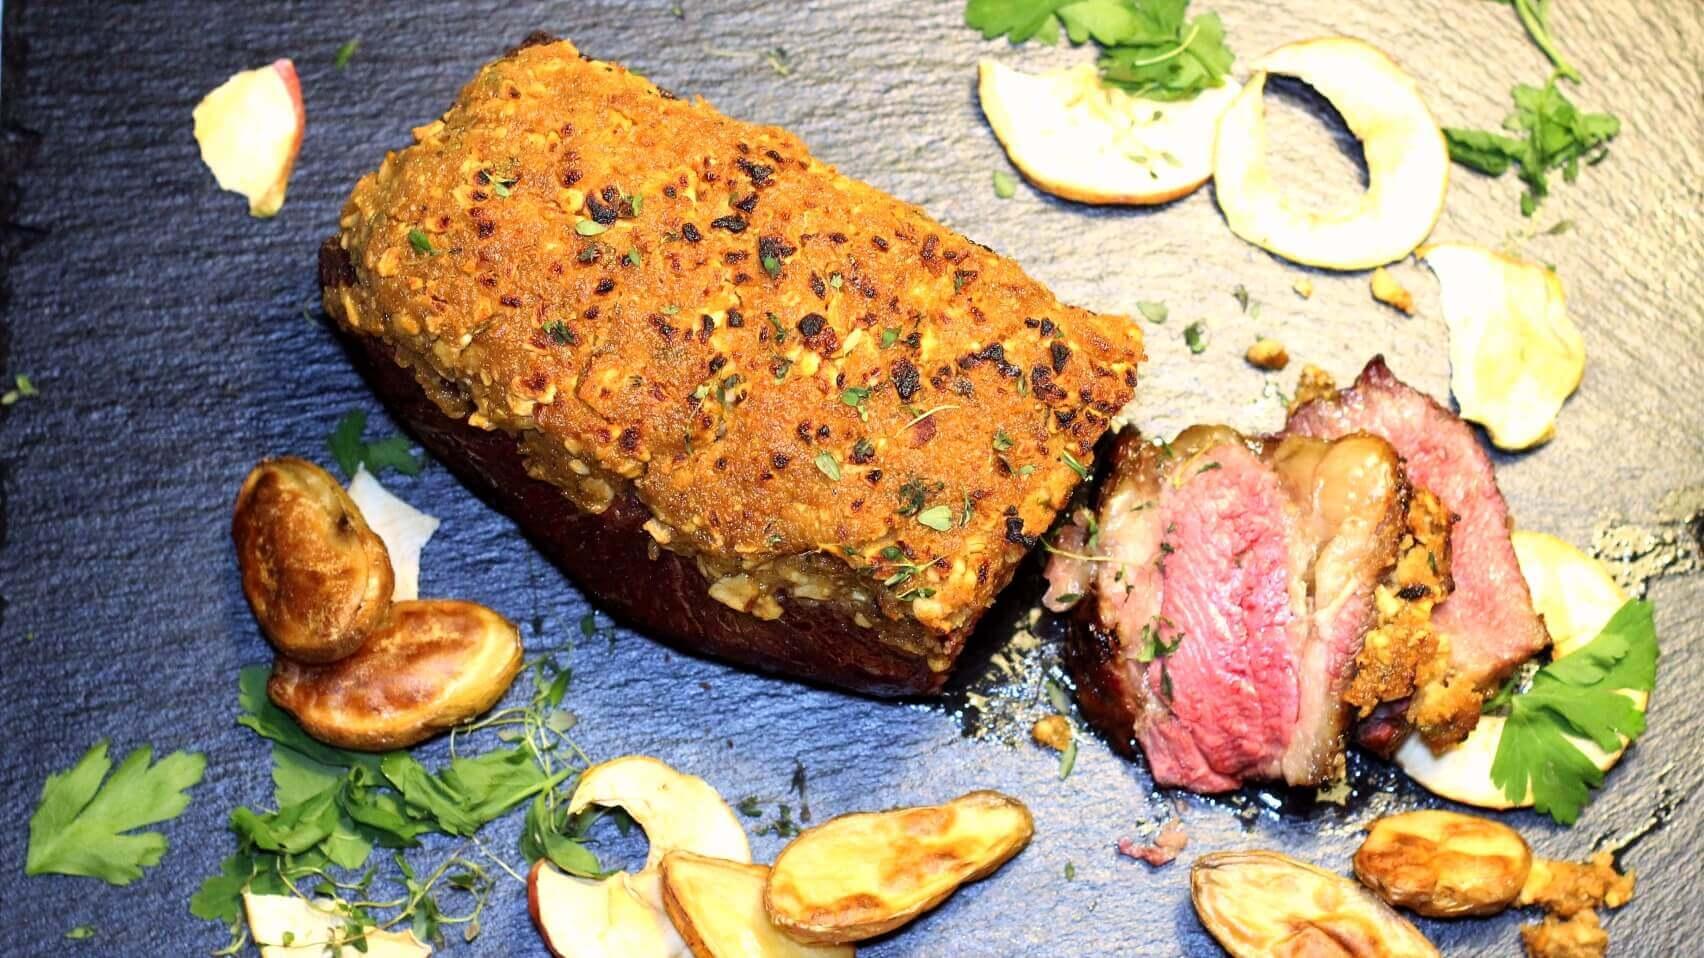 Dry Aged Roastbeef mit Apfel-Senf-Kruste roastbeef_Roastbeef Anschnitt